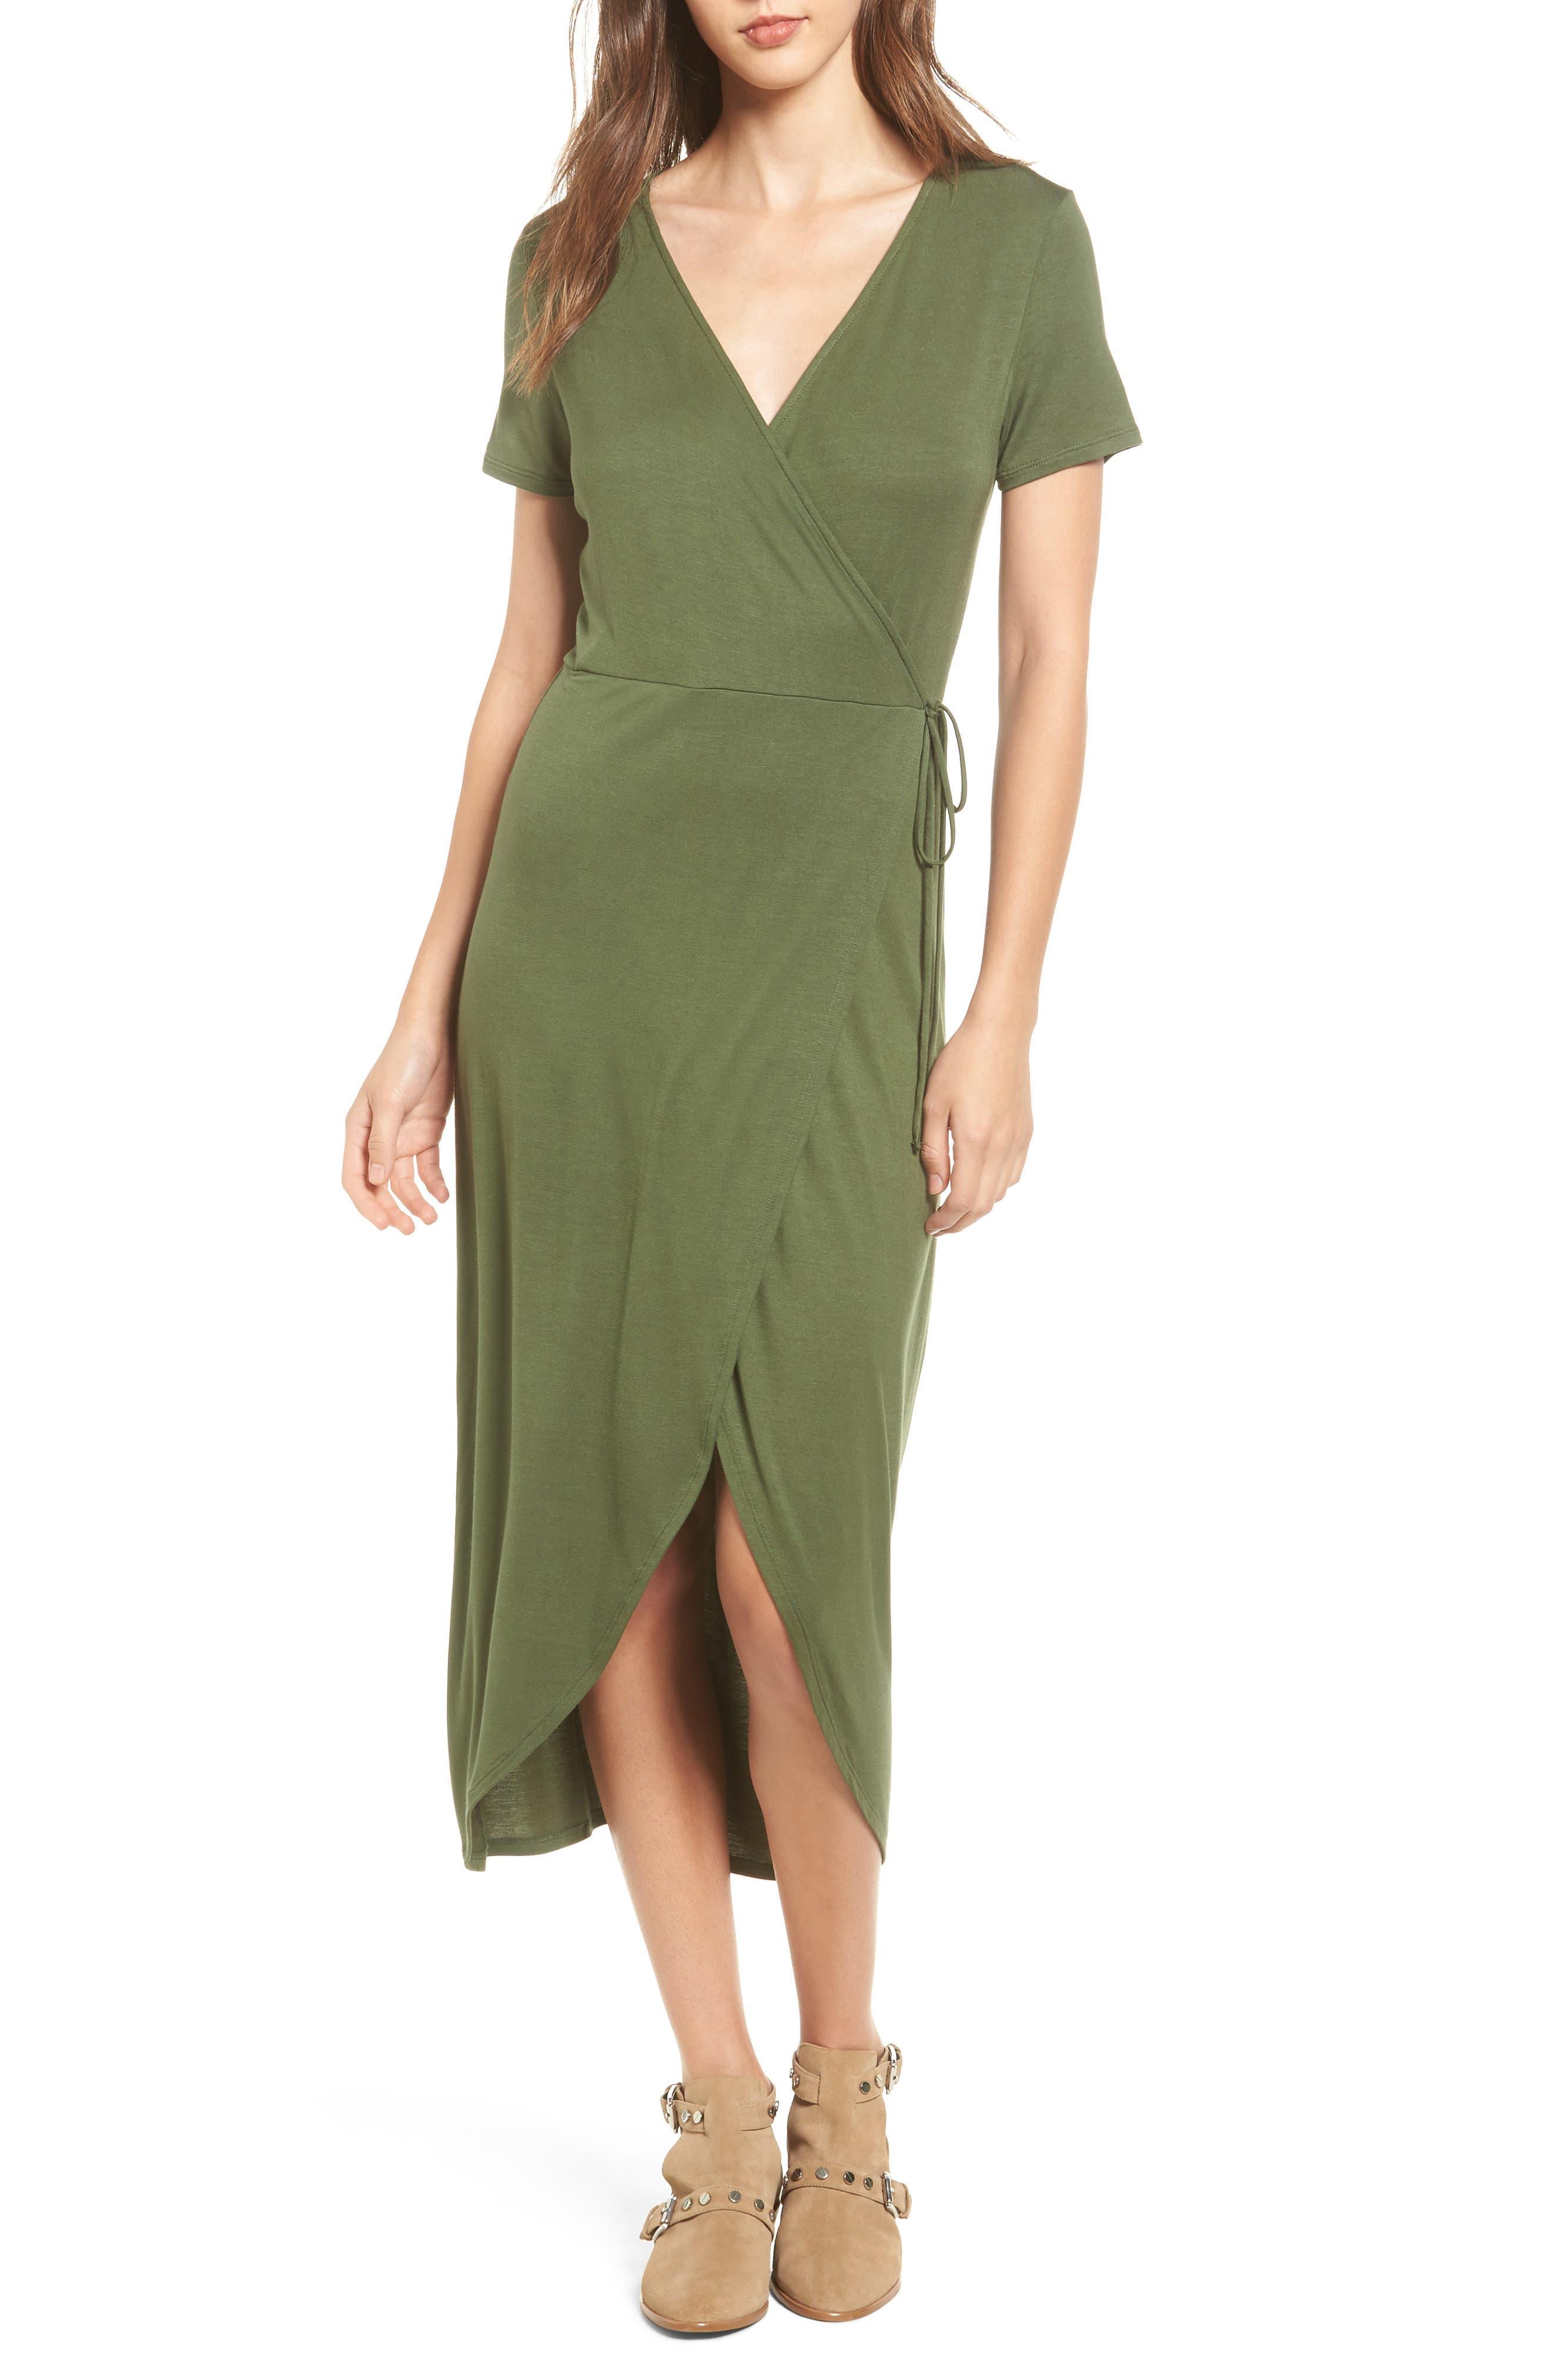 Alternate Image 1 Selected - One Clothing Knit Wrap Midi Dress